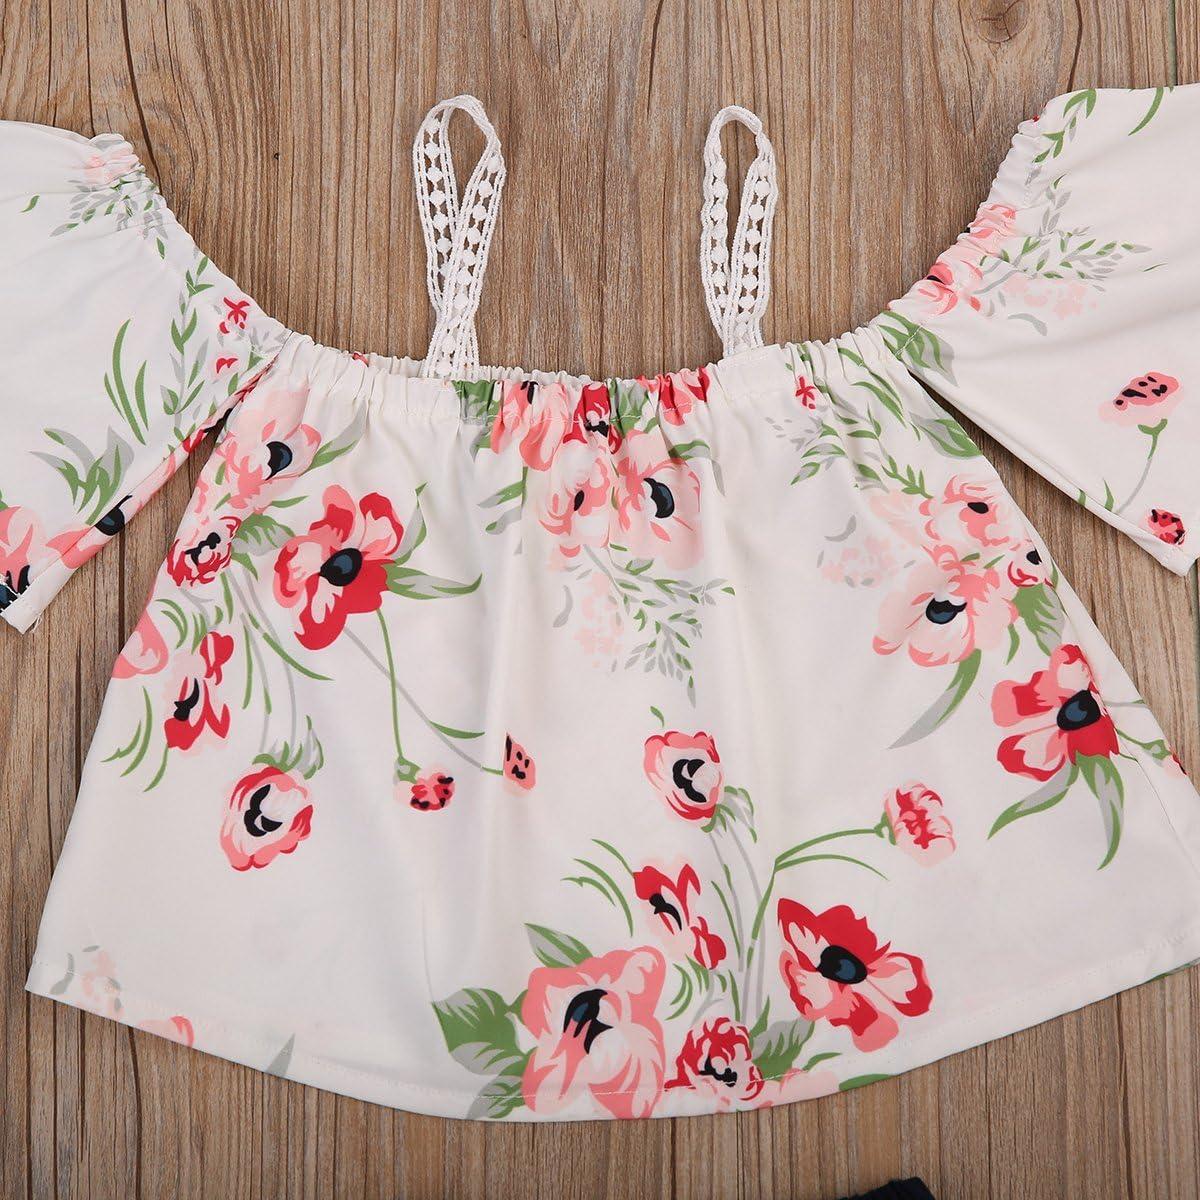 HBER 0-24M Baby Toddler Girl Summer Clothes Floral Off Shoulder Tank Tops Short Pants Outfits Sets